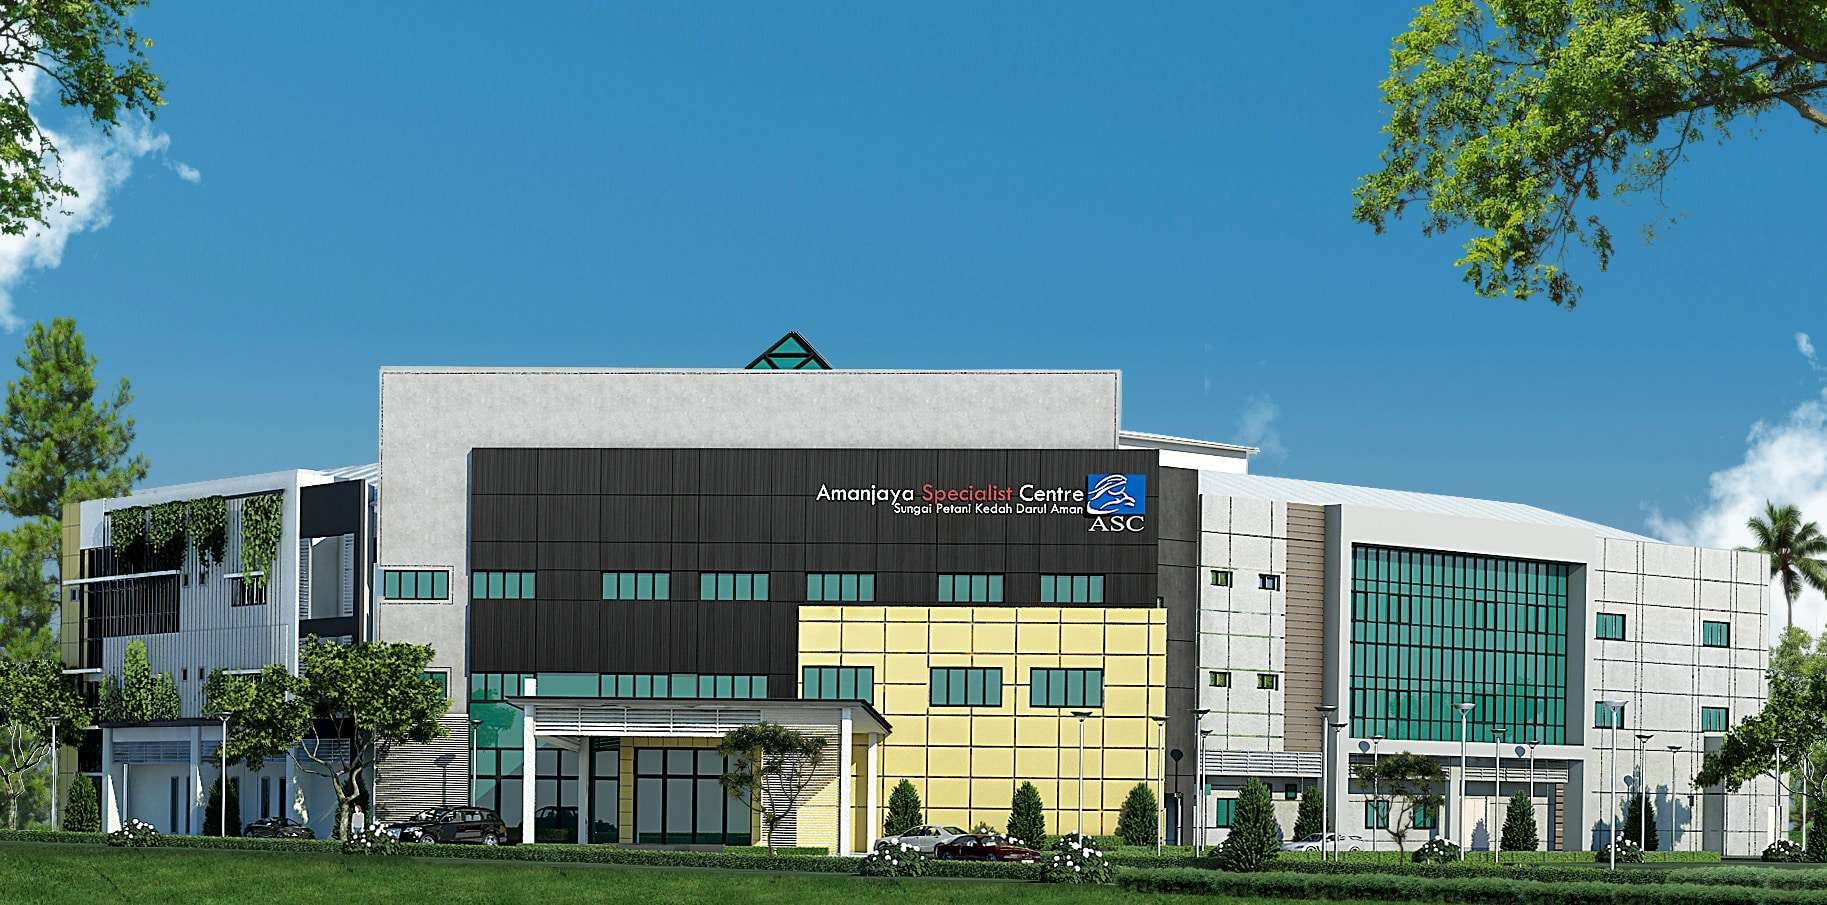 Amanjaya Specialist Centre